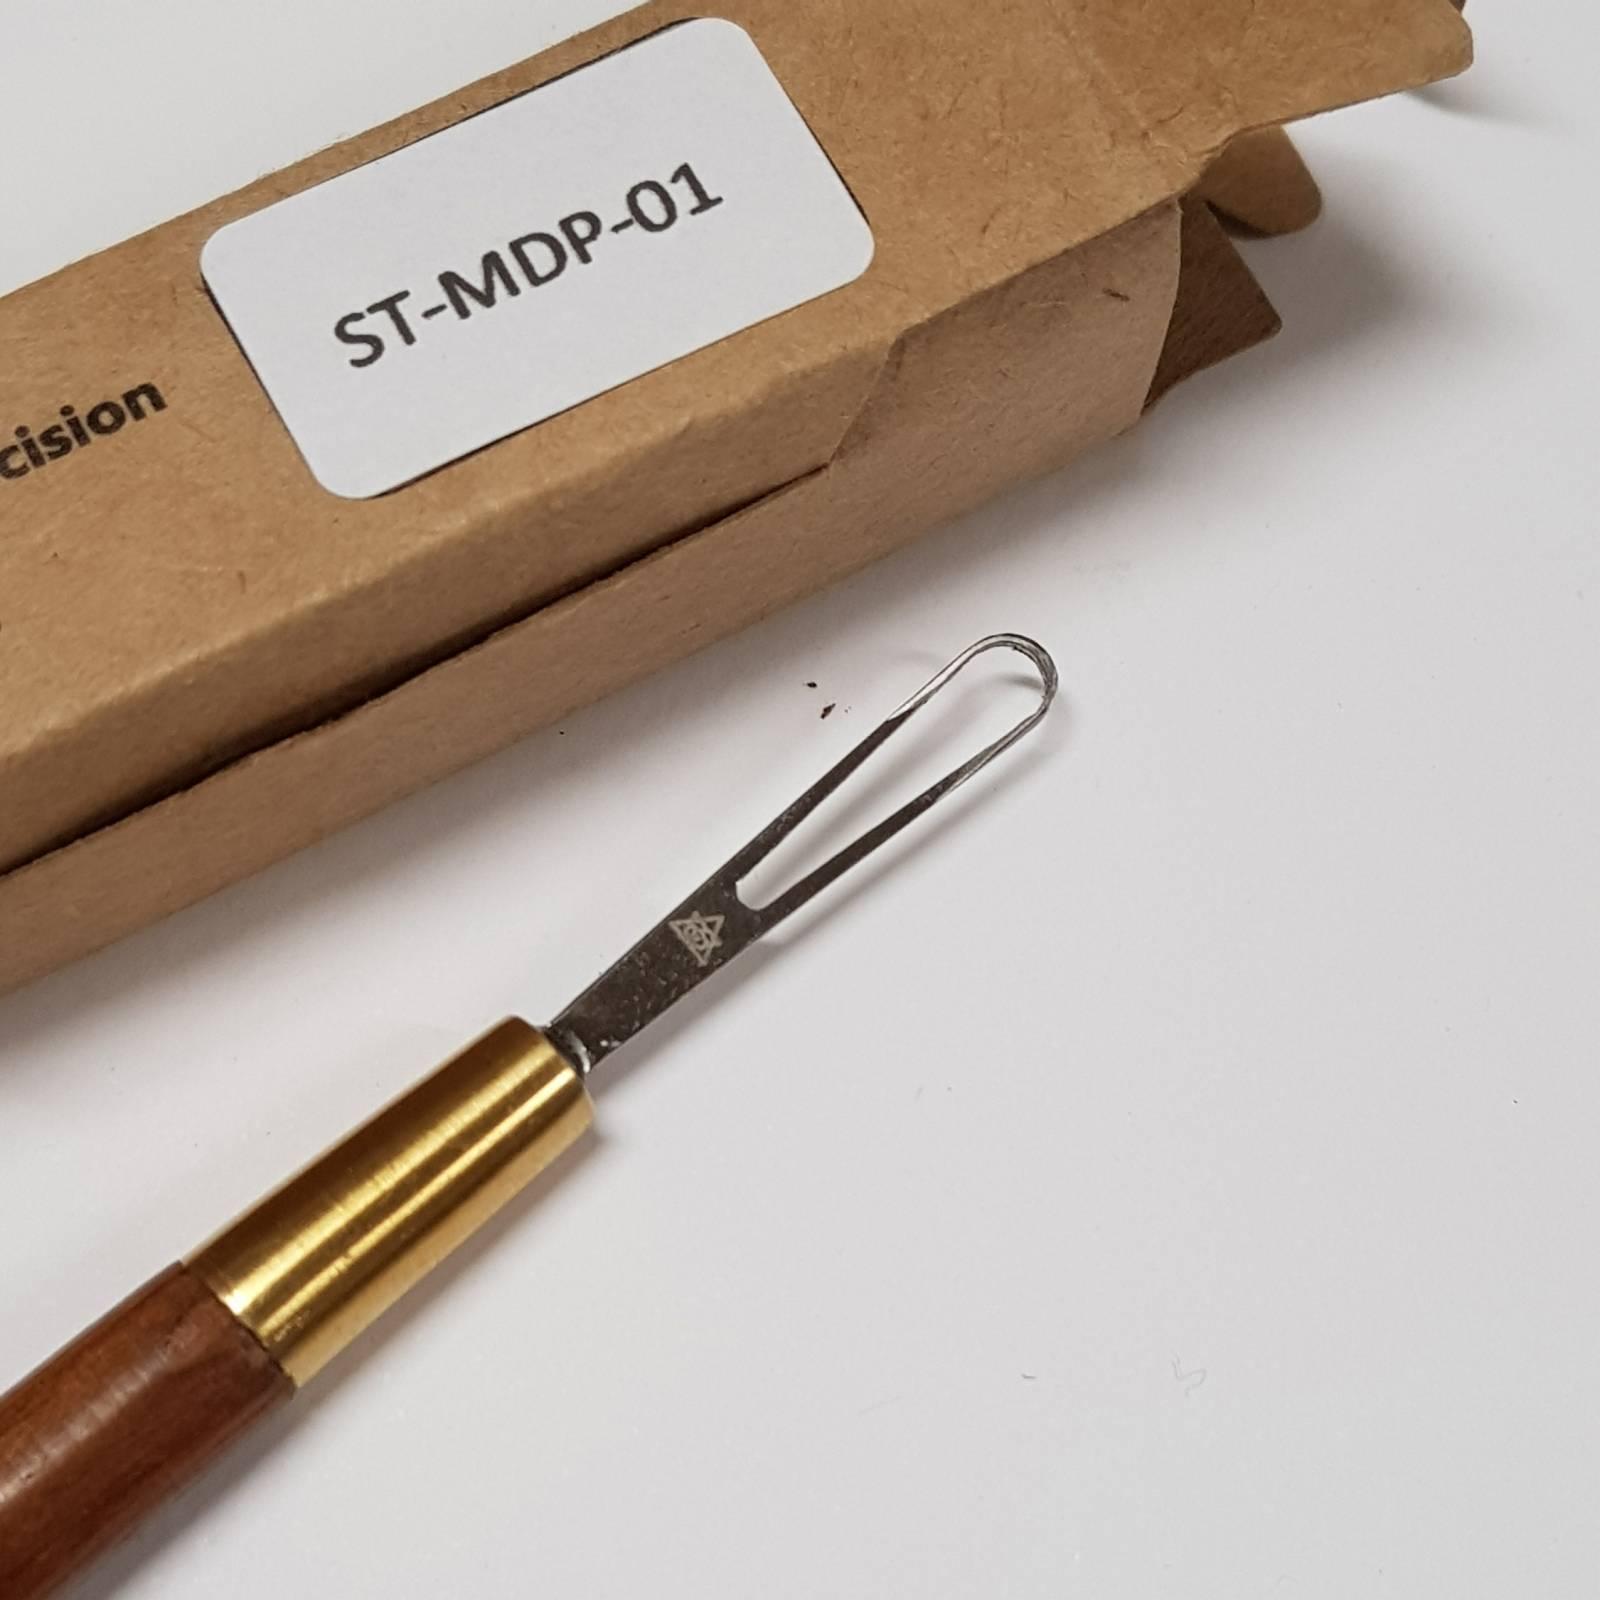 Sculpting tool ST-MDP-01